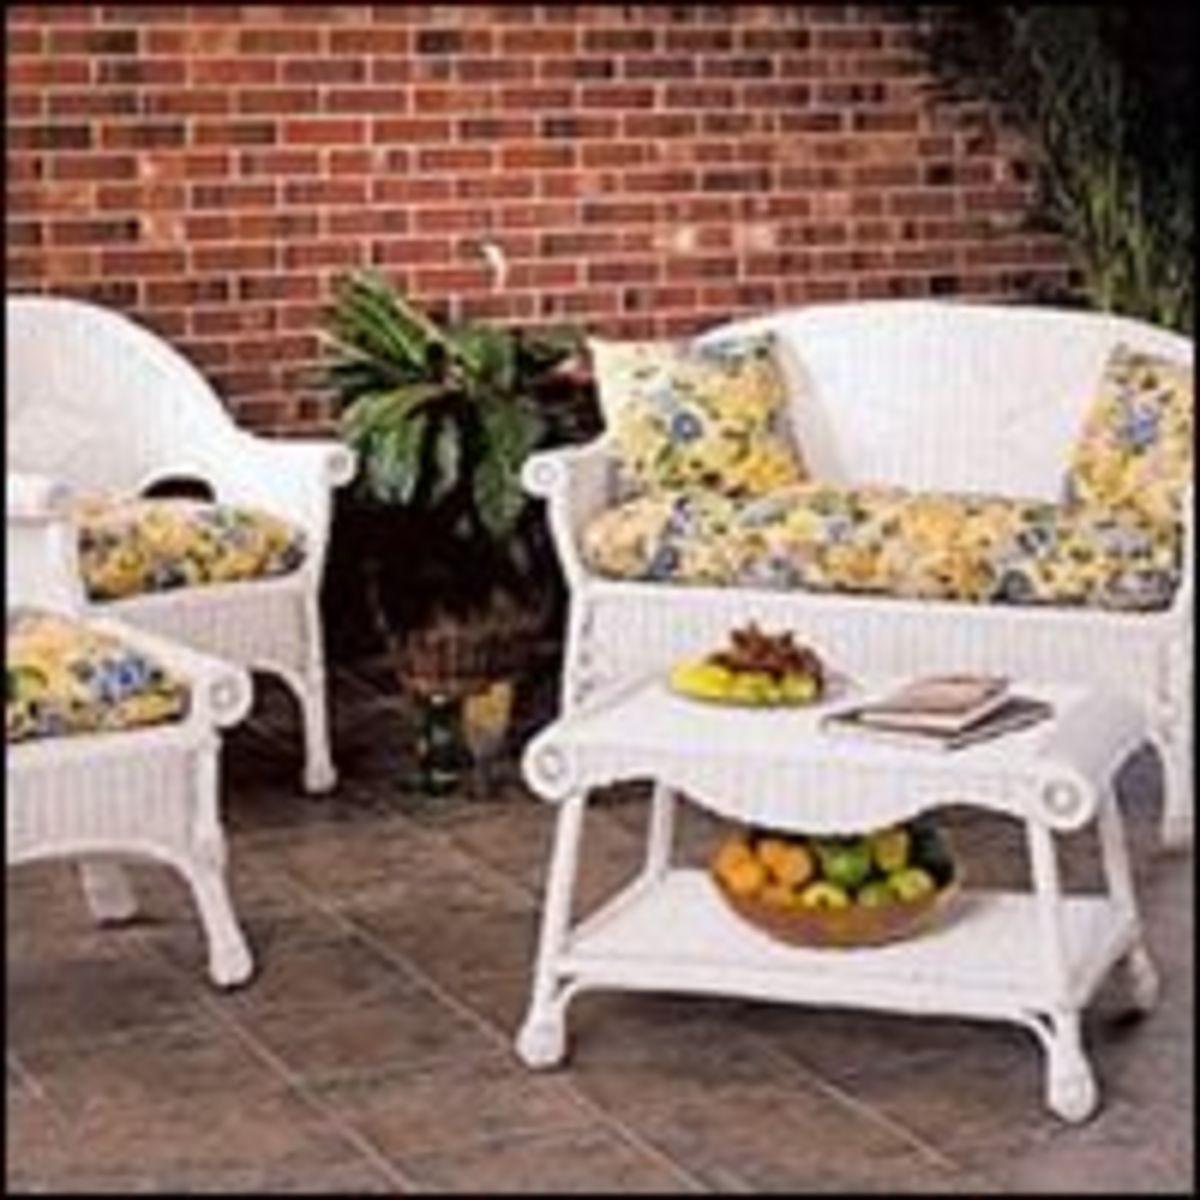 Restoring Wicker Furniture Paint